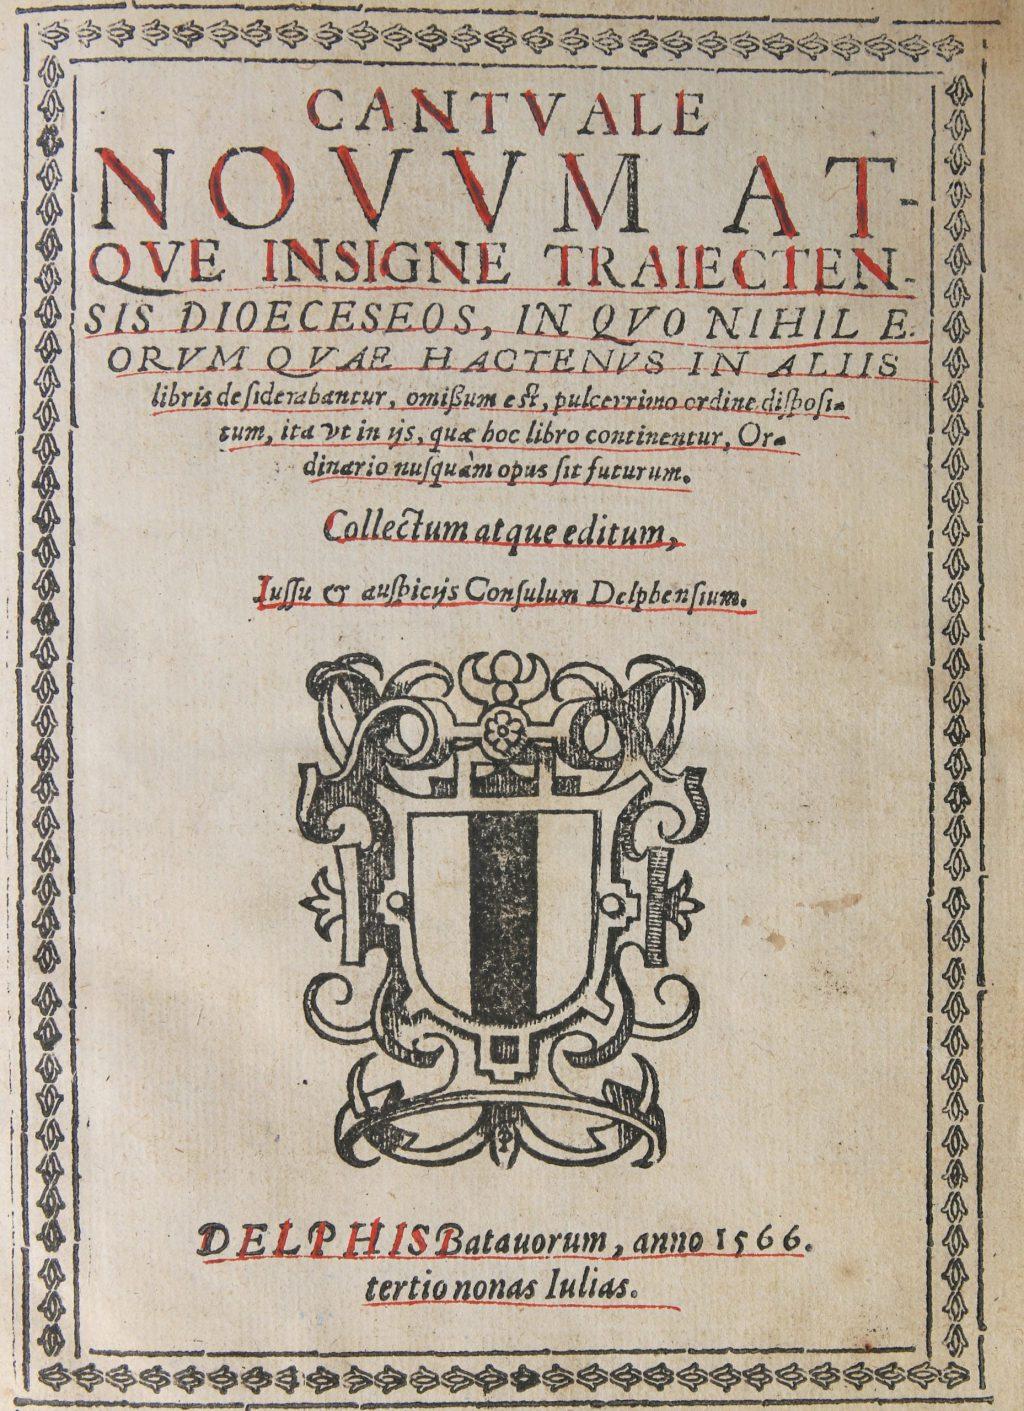 Titelpagina van Cantuale Novum (Bibliotheek, 59 C 26)